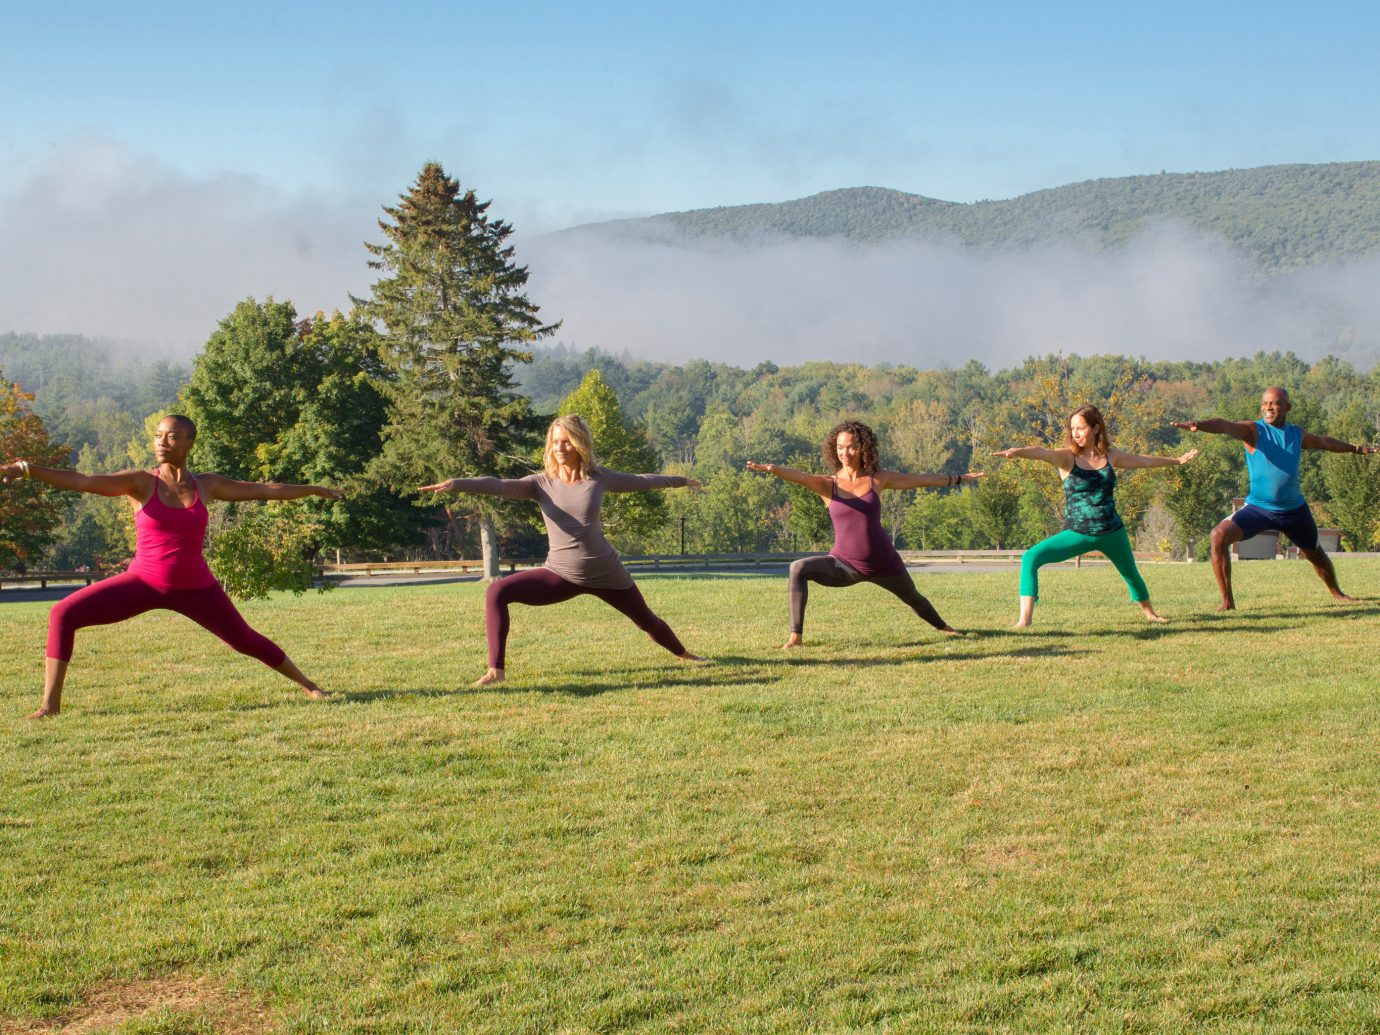 Health + Wellness Meditation Retreats Spa Retreats Trip Ideas Yoga Retreats grass sky outdoor human action field sports physical fitness Sport physical exercise